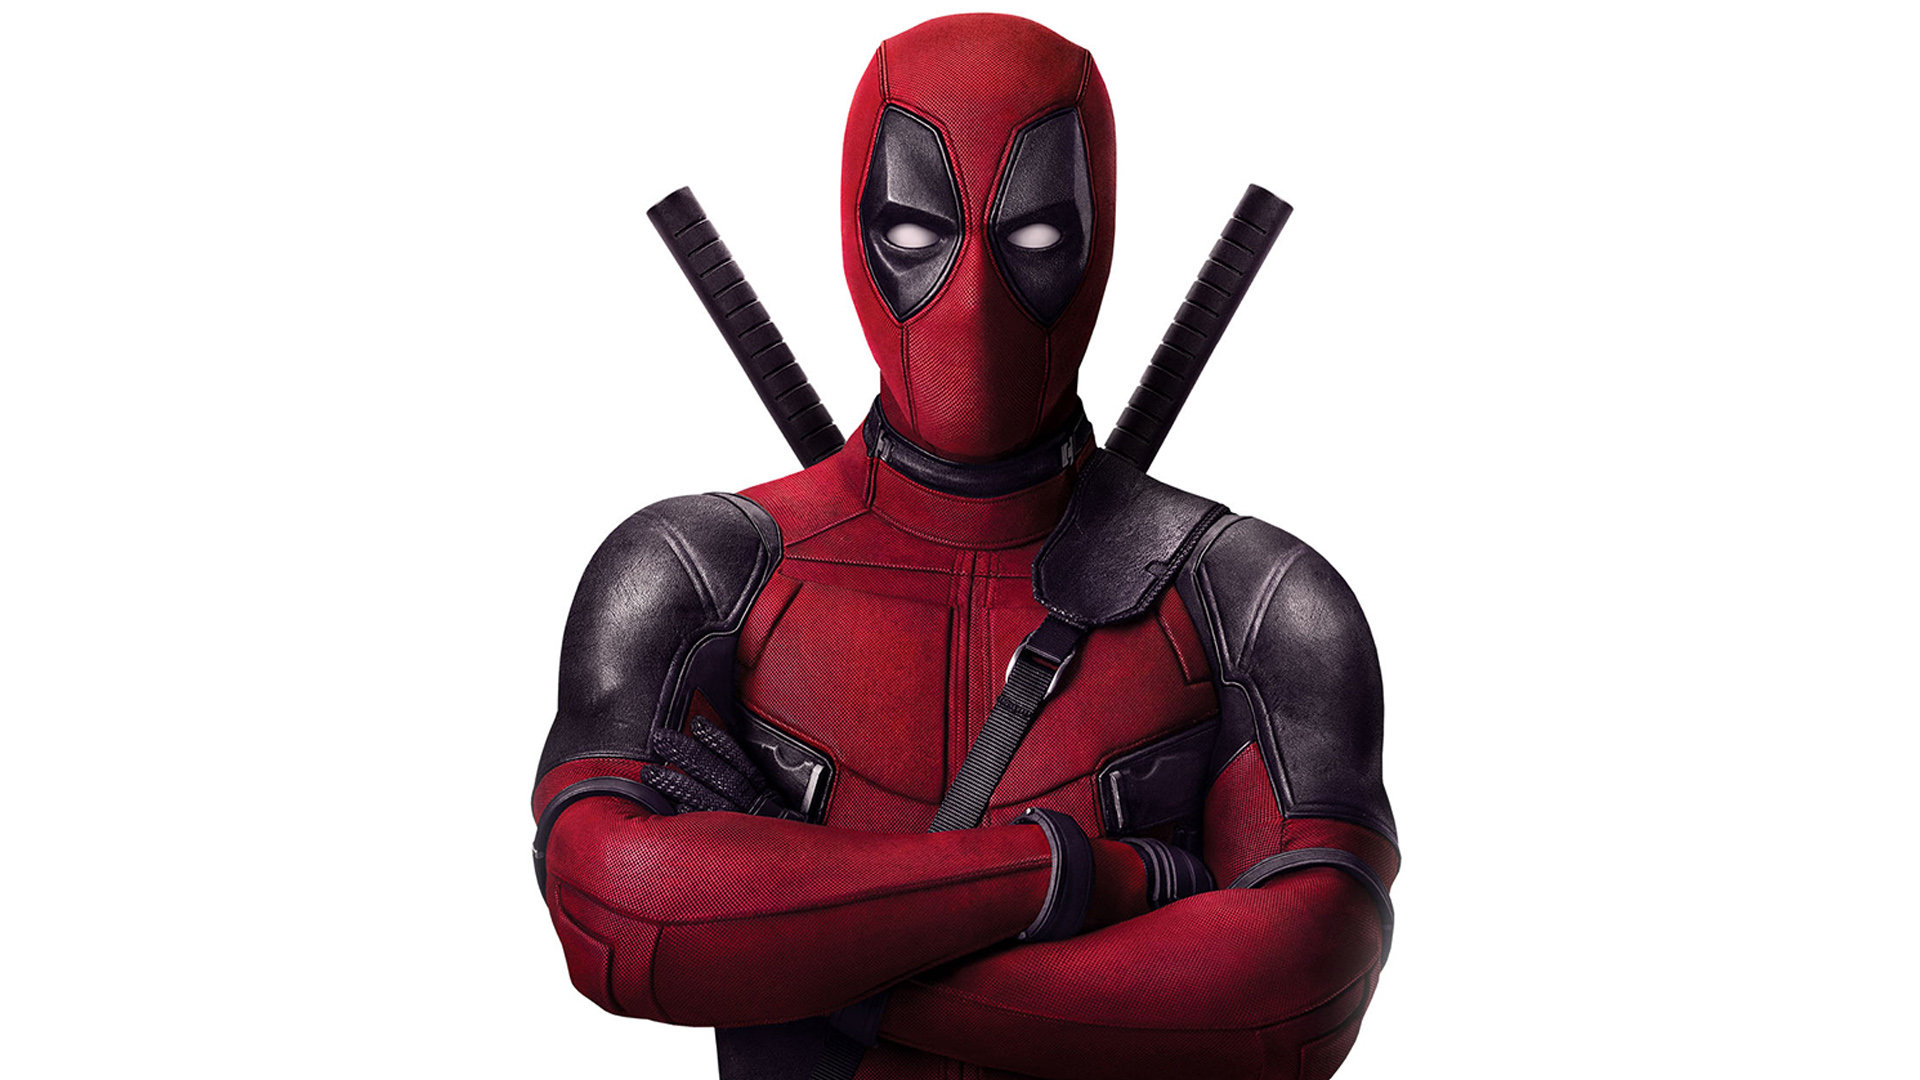 Deadpool movie wallpapers 1920x1080 full hd 1080p - Deadpool download 1080p ...